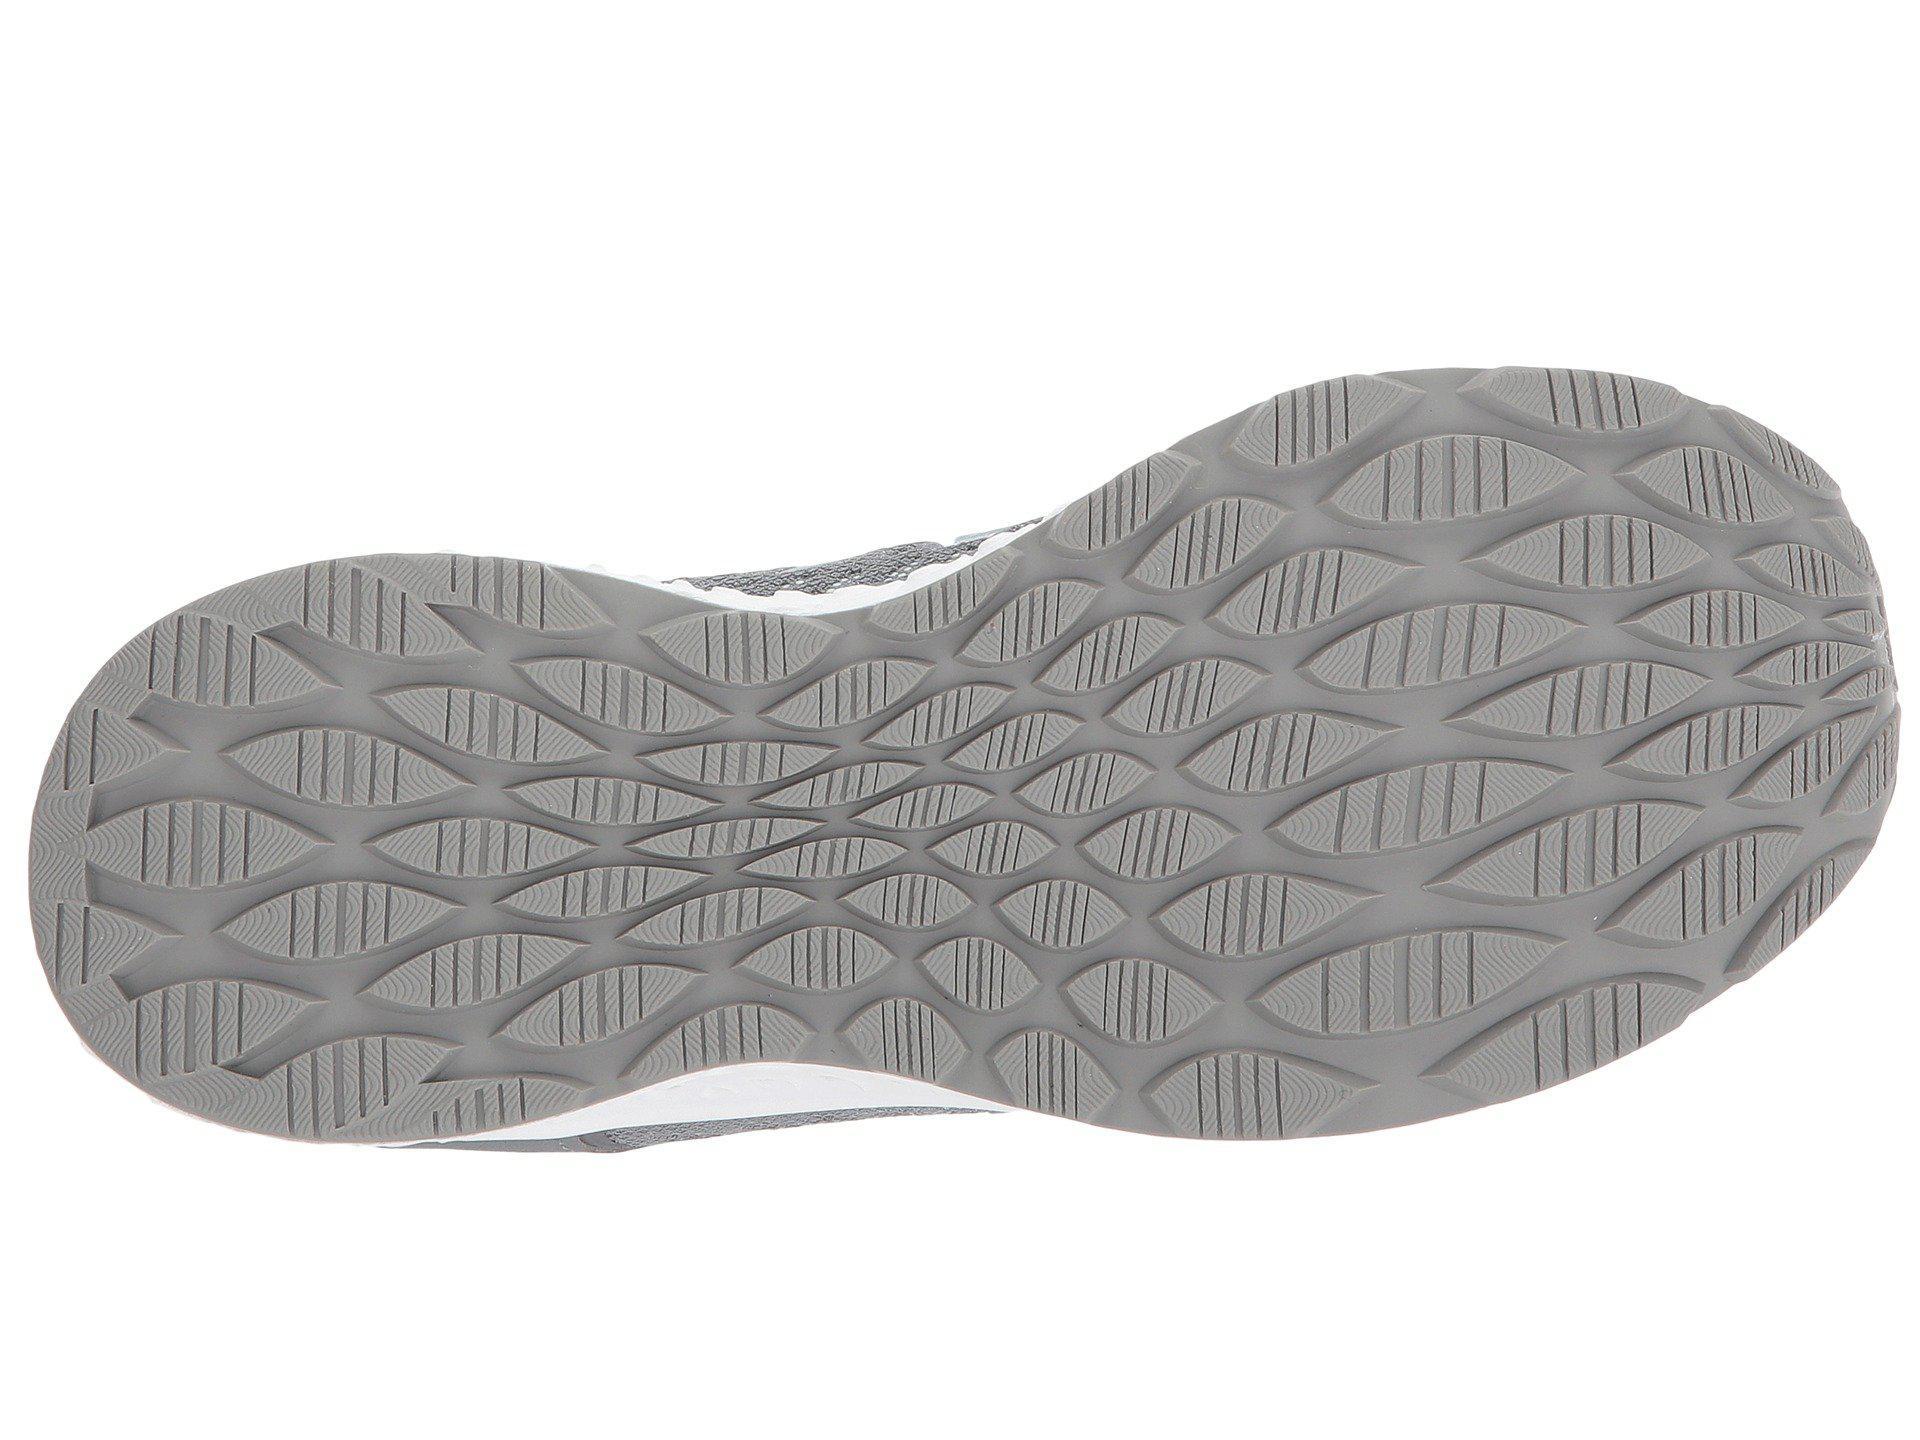 5c36b388c51b2 Lyst - New Balance 420v4 (thunder seafoam) Women s Running Shoes in Gray